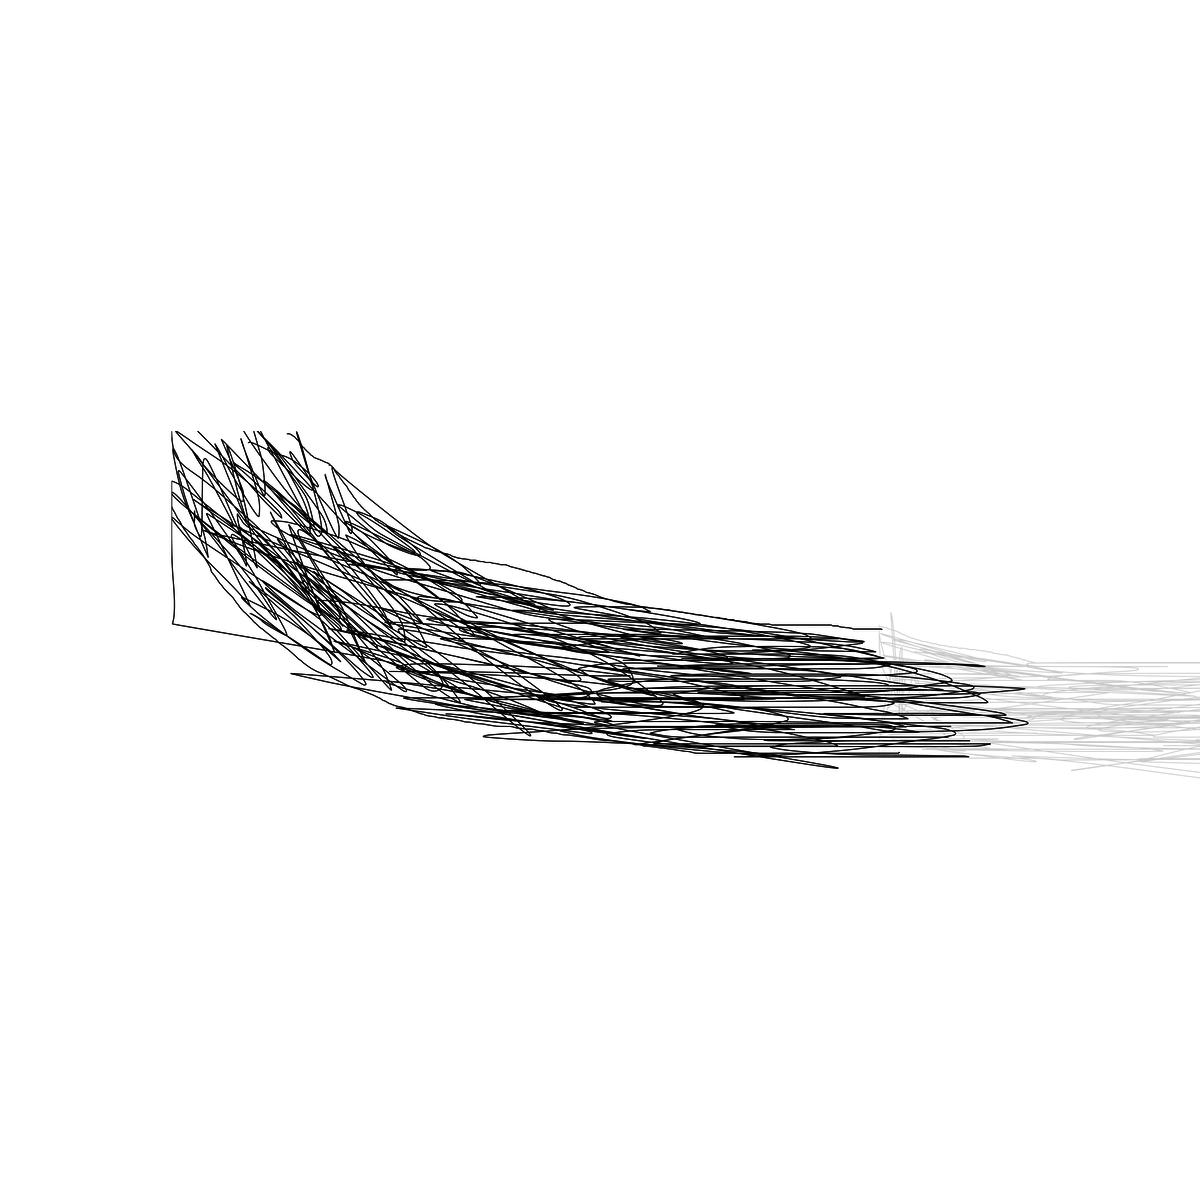 BAAAM drawing#11431 lat:52.4758529663085940lng: 13.4055328369140620